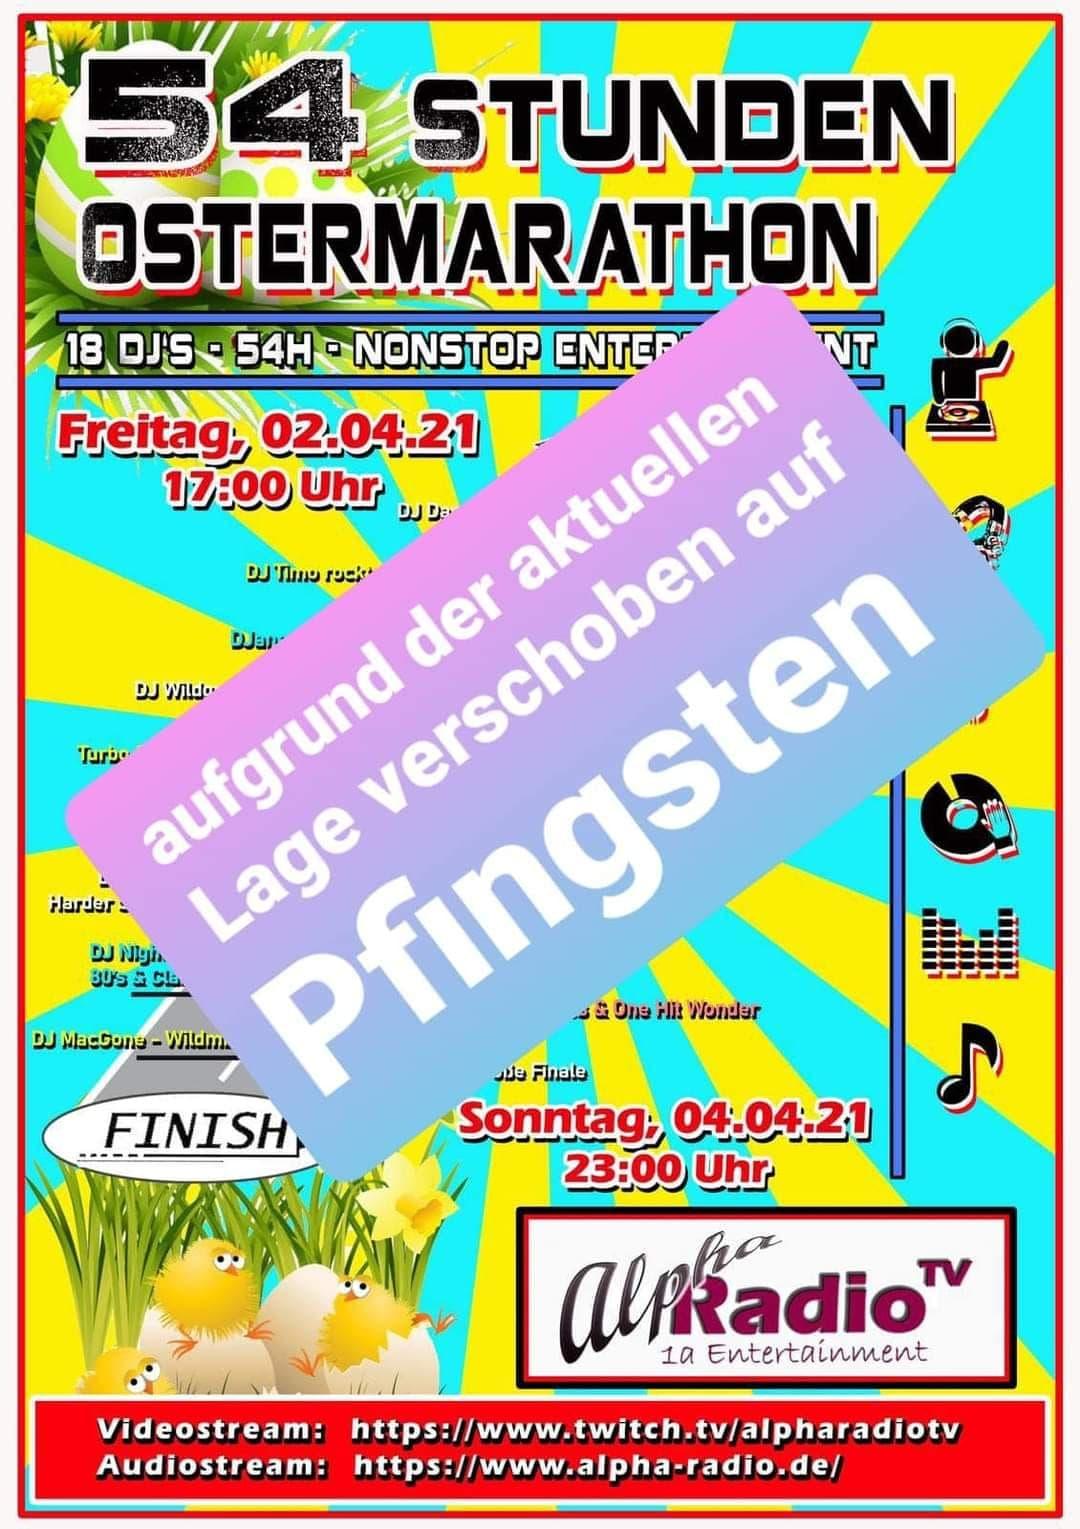 Pfingstmarathon